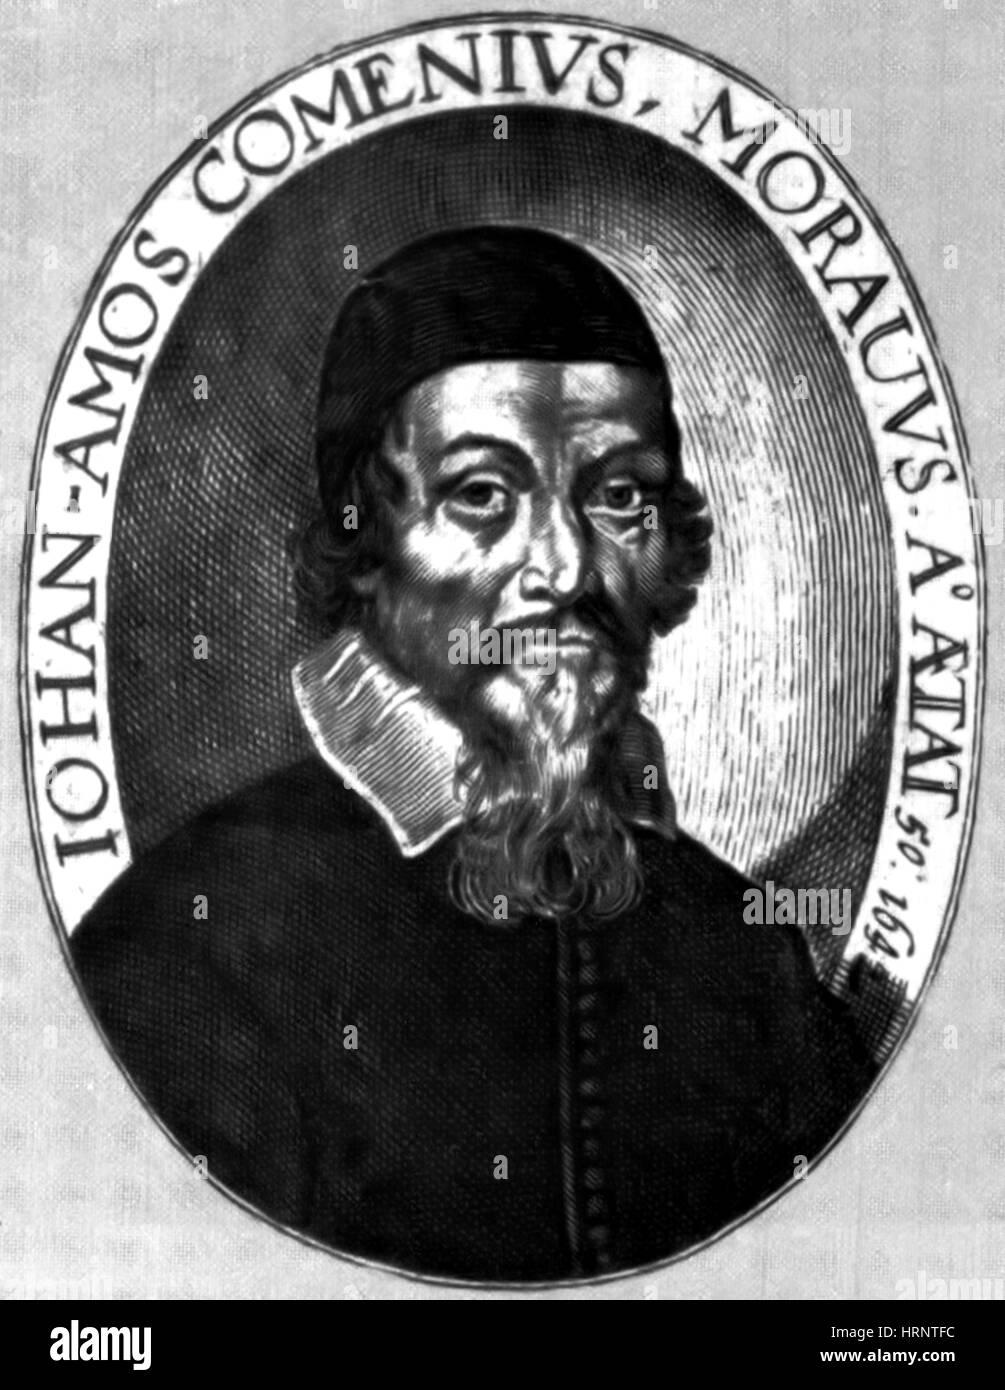 Johann Amos Comenius, Czech Educator - Stock Image